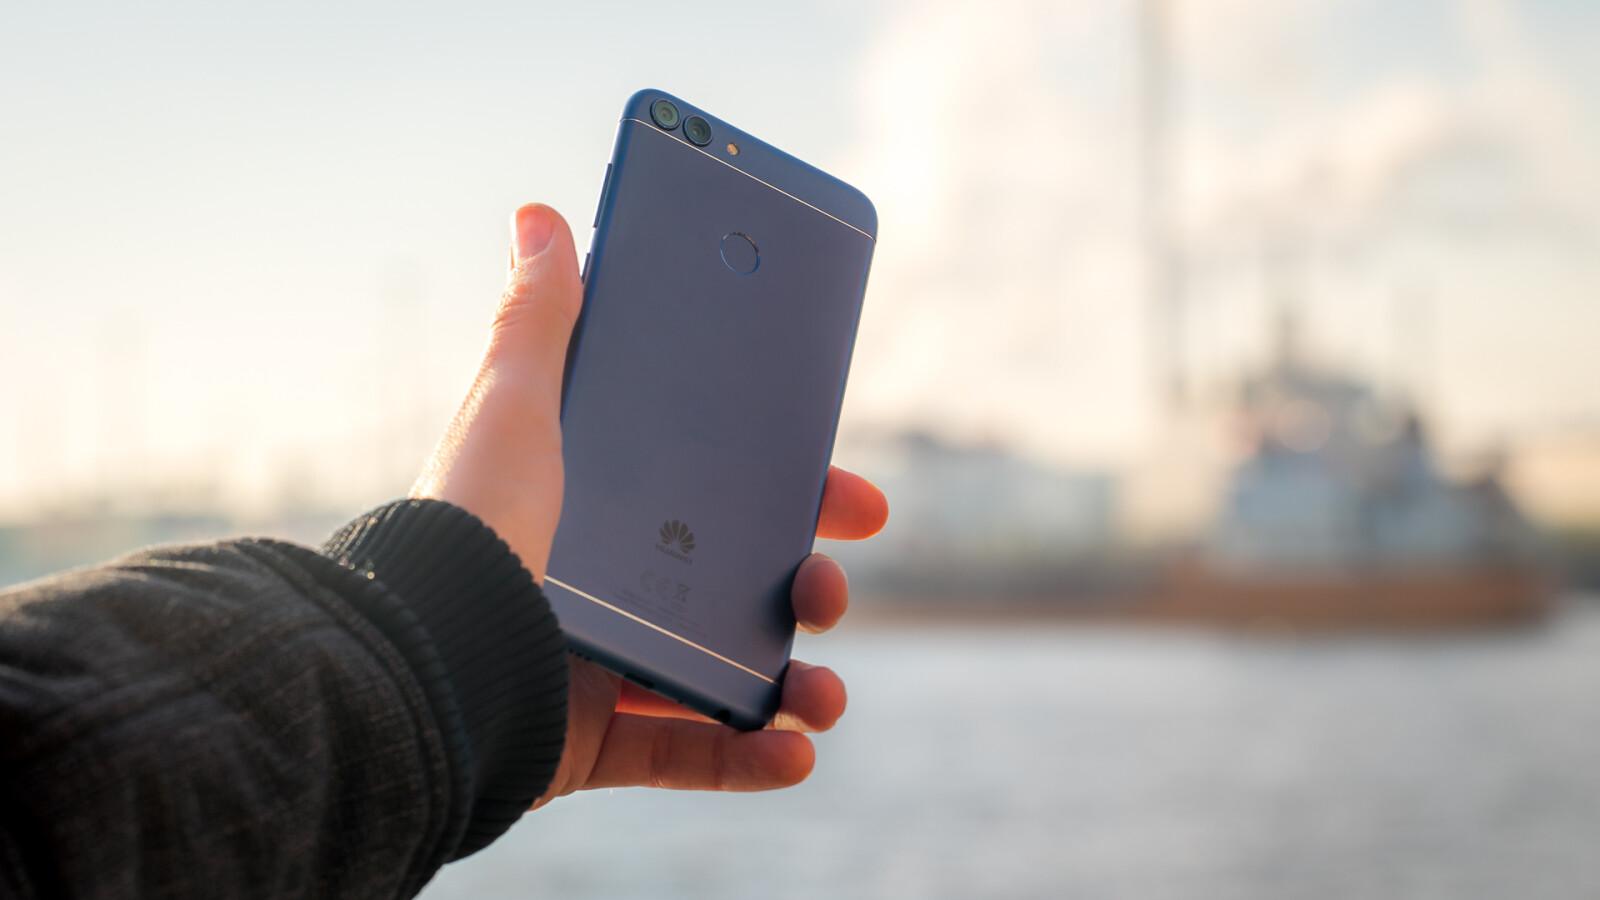 Huawei P Smart 2019 Sim Karte Einlegen.Huawei P Smart Im Test Android 8 Dual Kamera Und 18 9